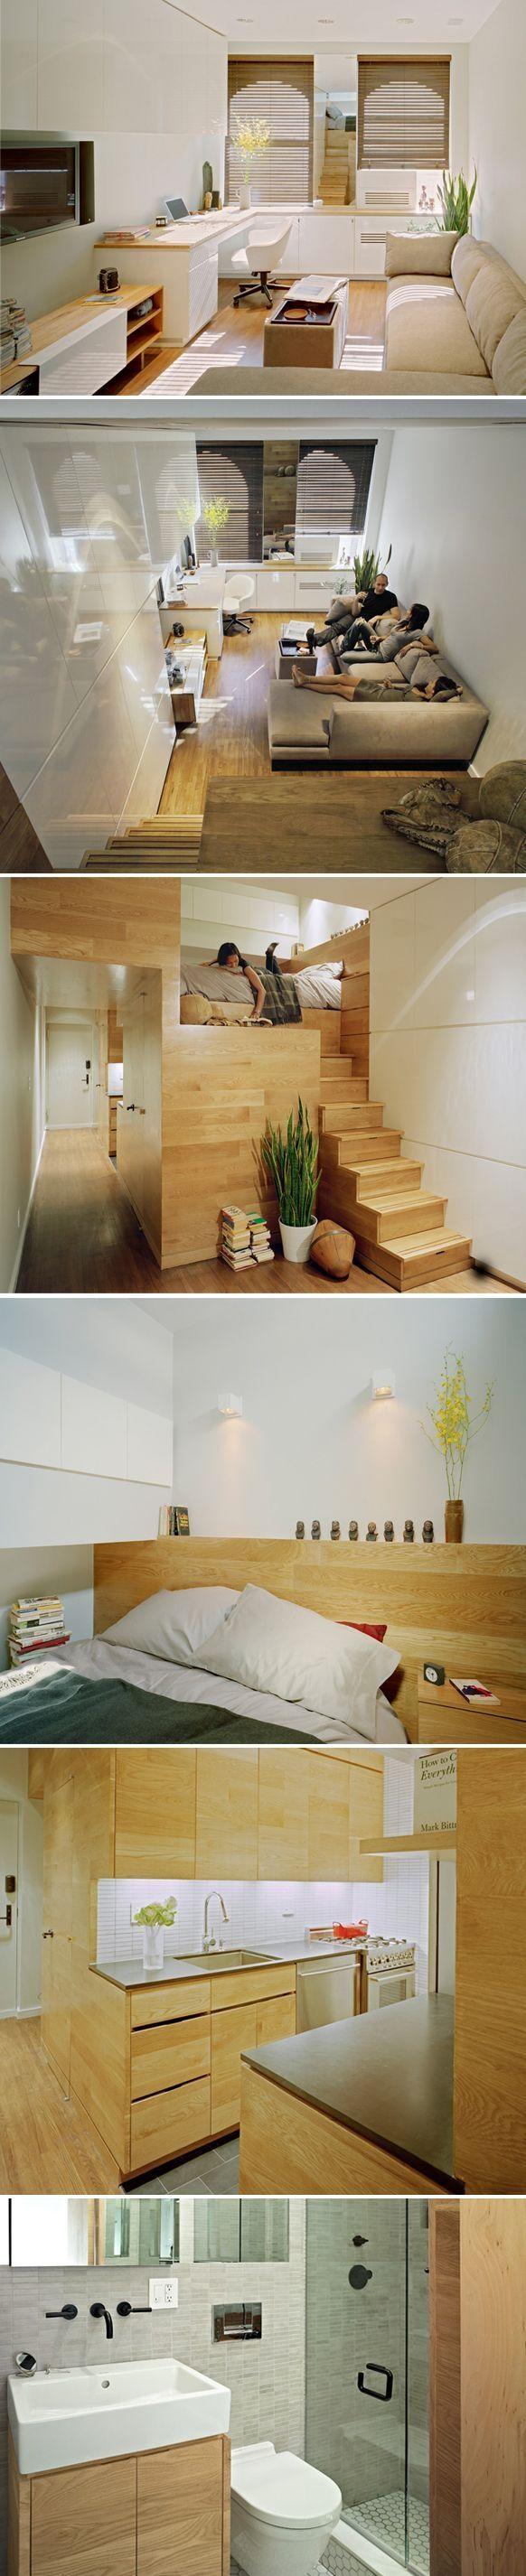 Small apartment by debora